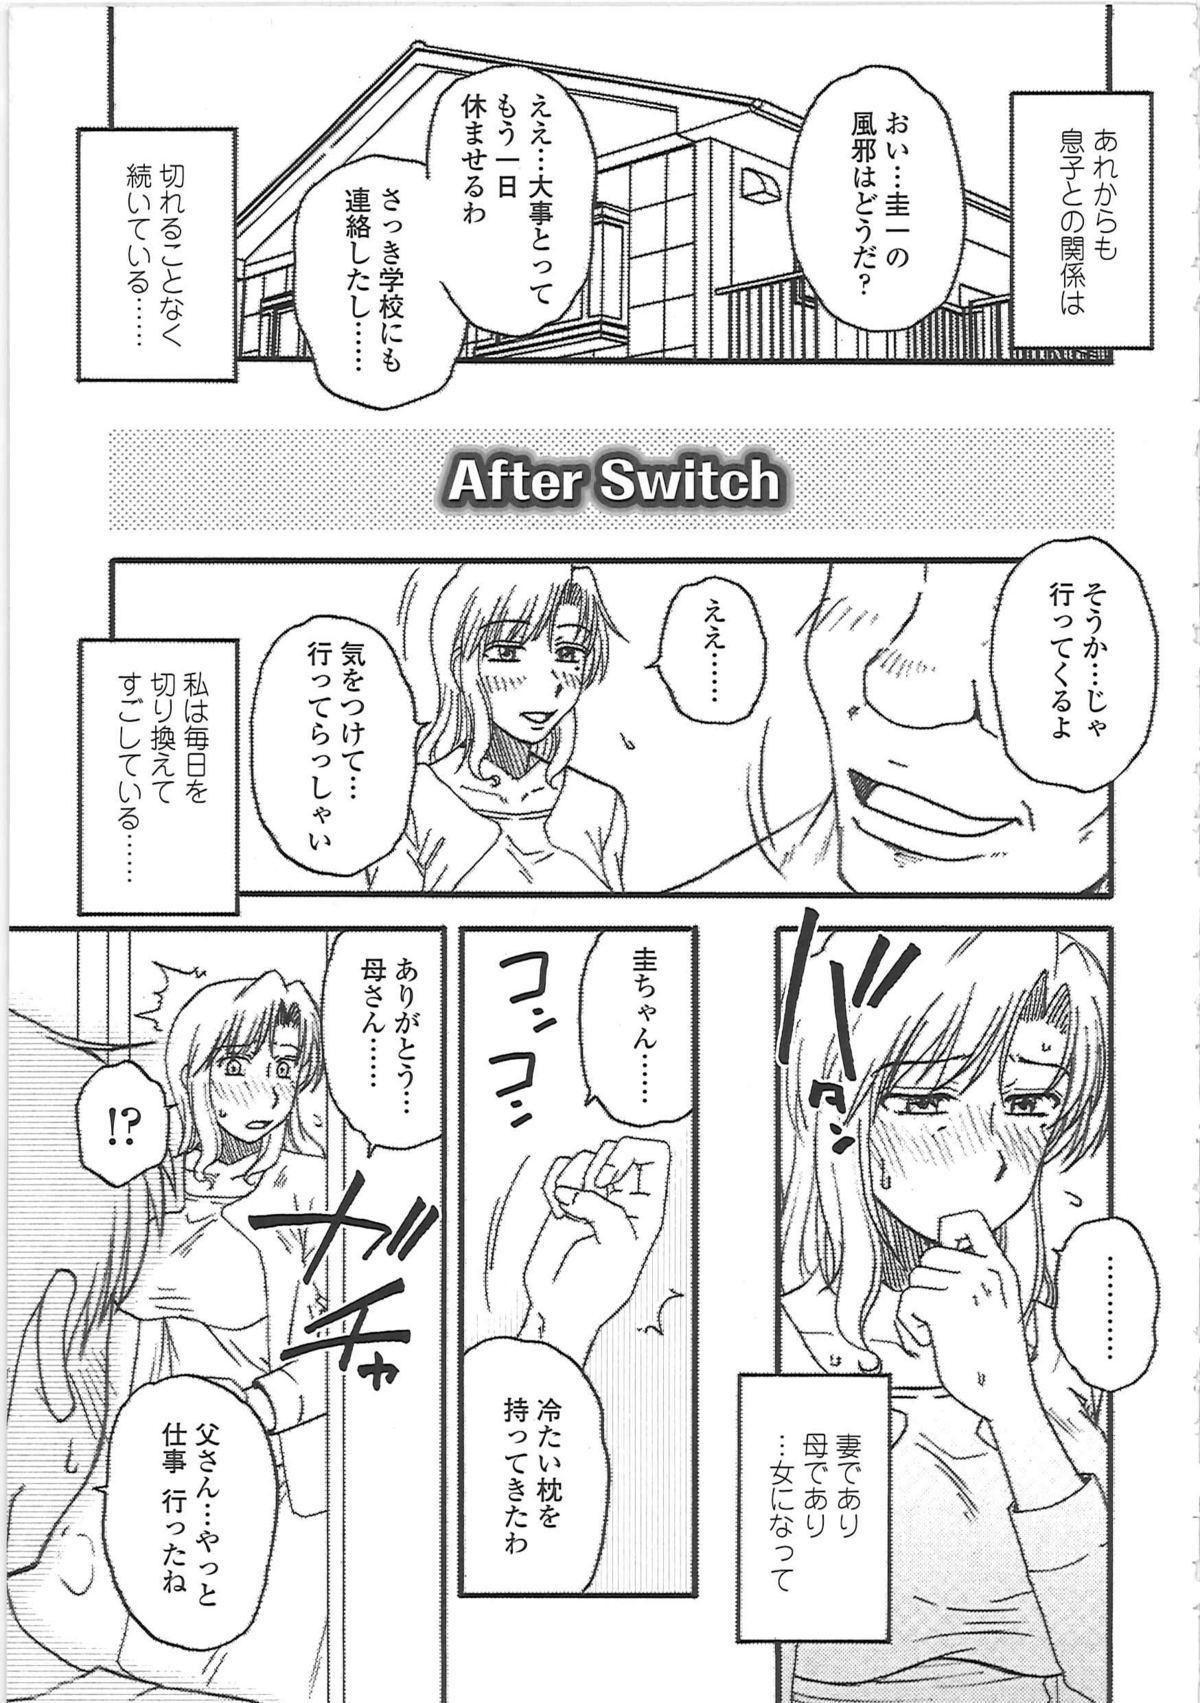 Nikuzuma Tsuushin - Erotic Wife Communication 179